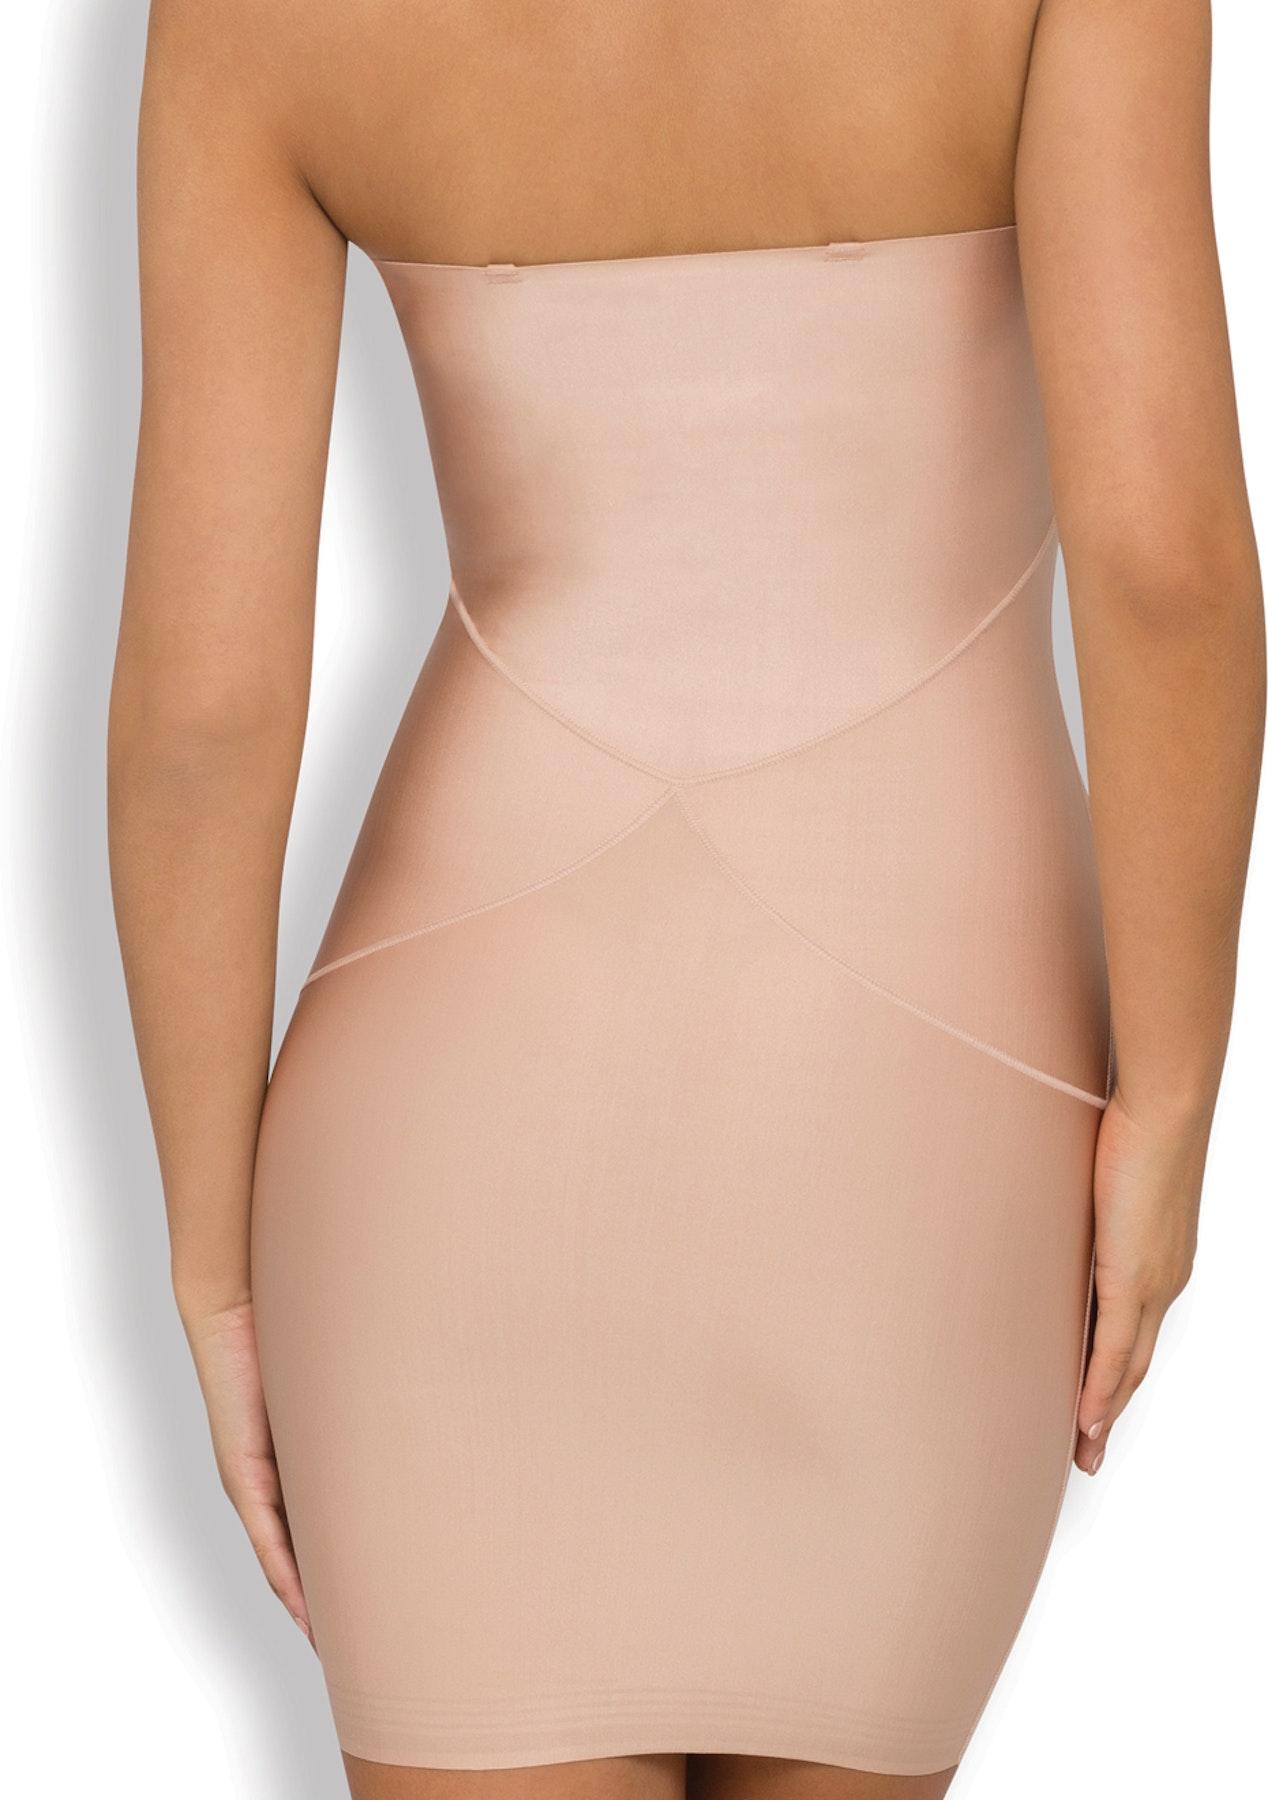 76cb39e88ef Nancy Ganz - Body Architect Slip Dress - Warm Taupe - Underwear Outlet -  Onceit